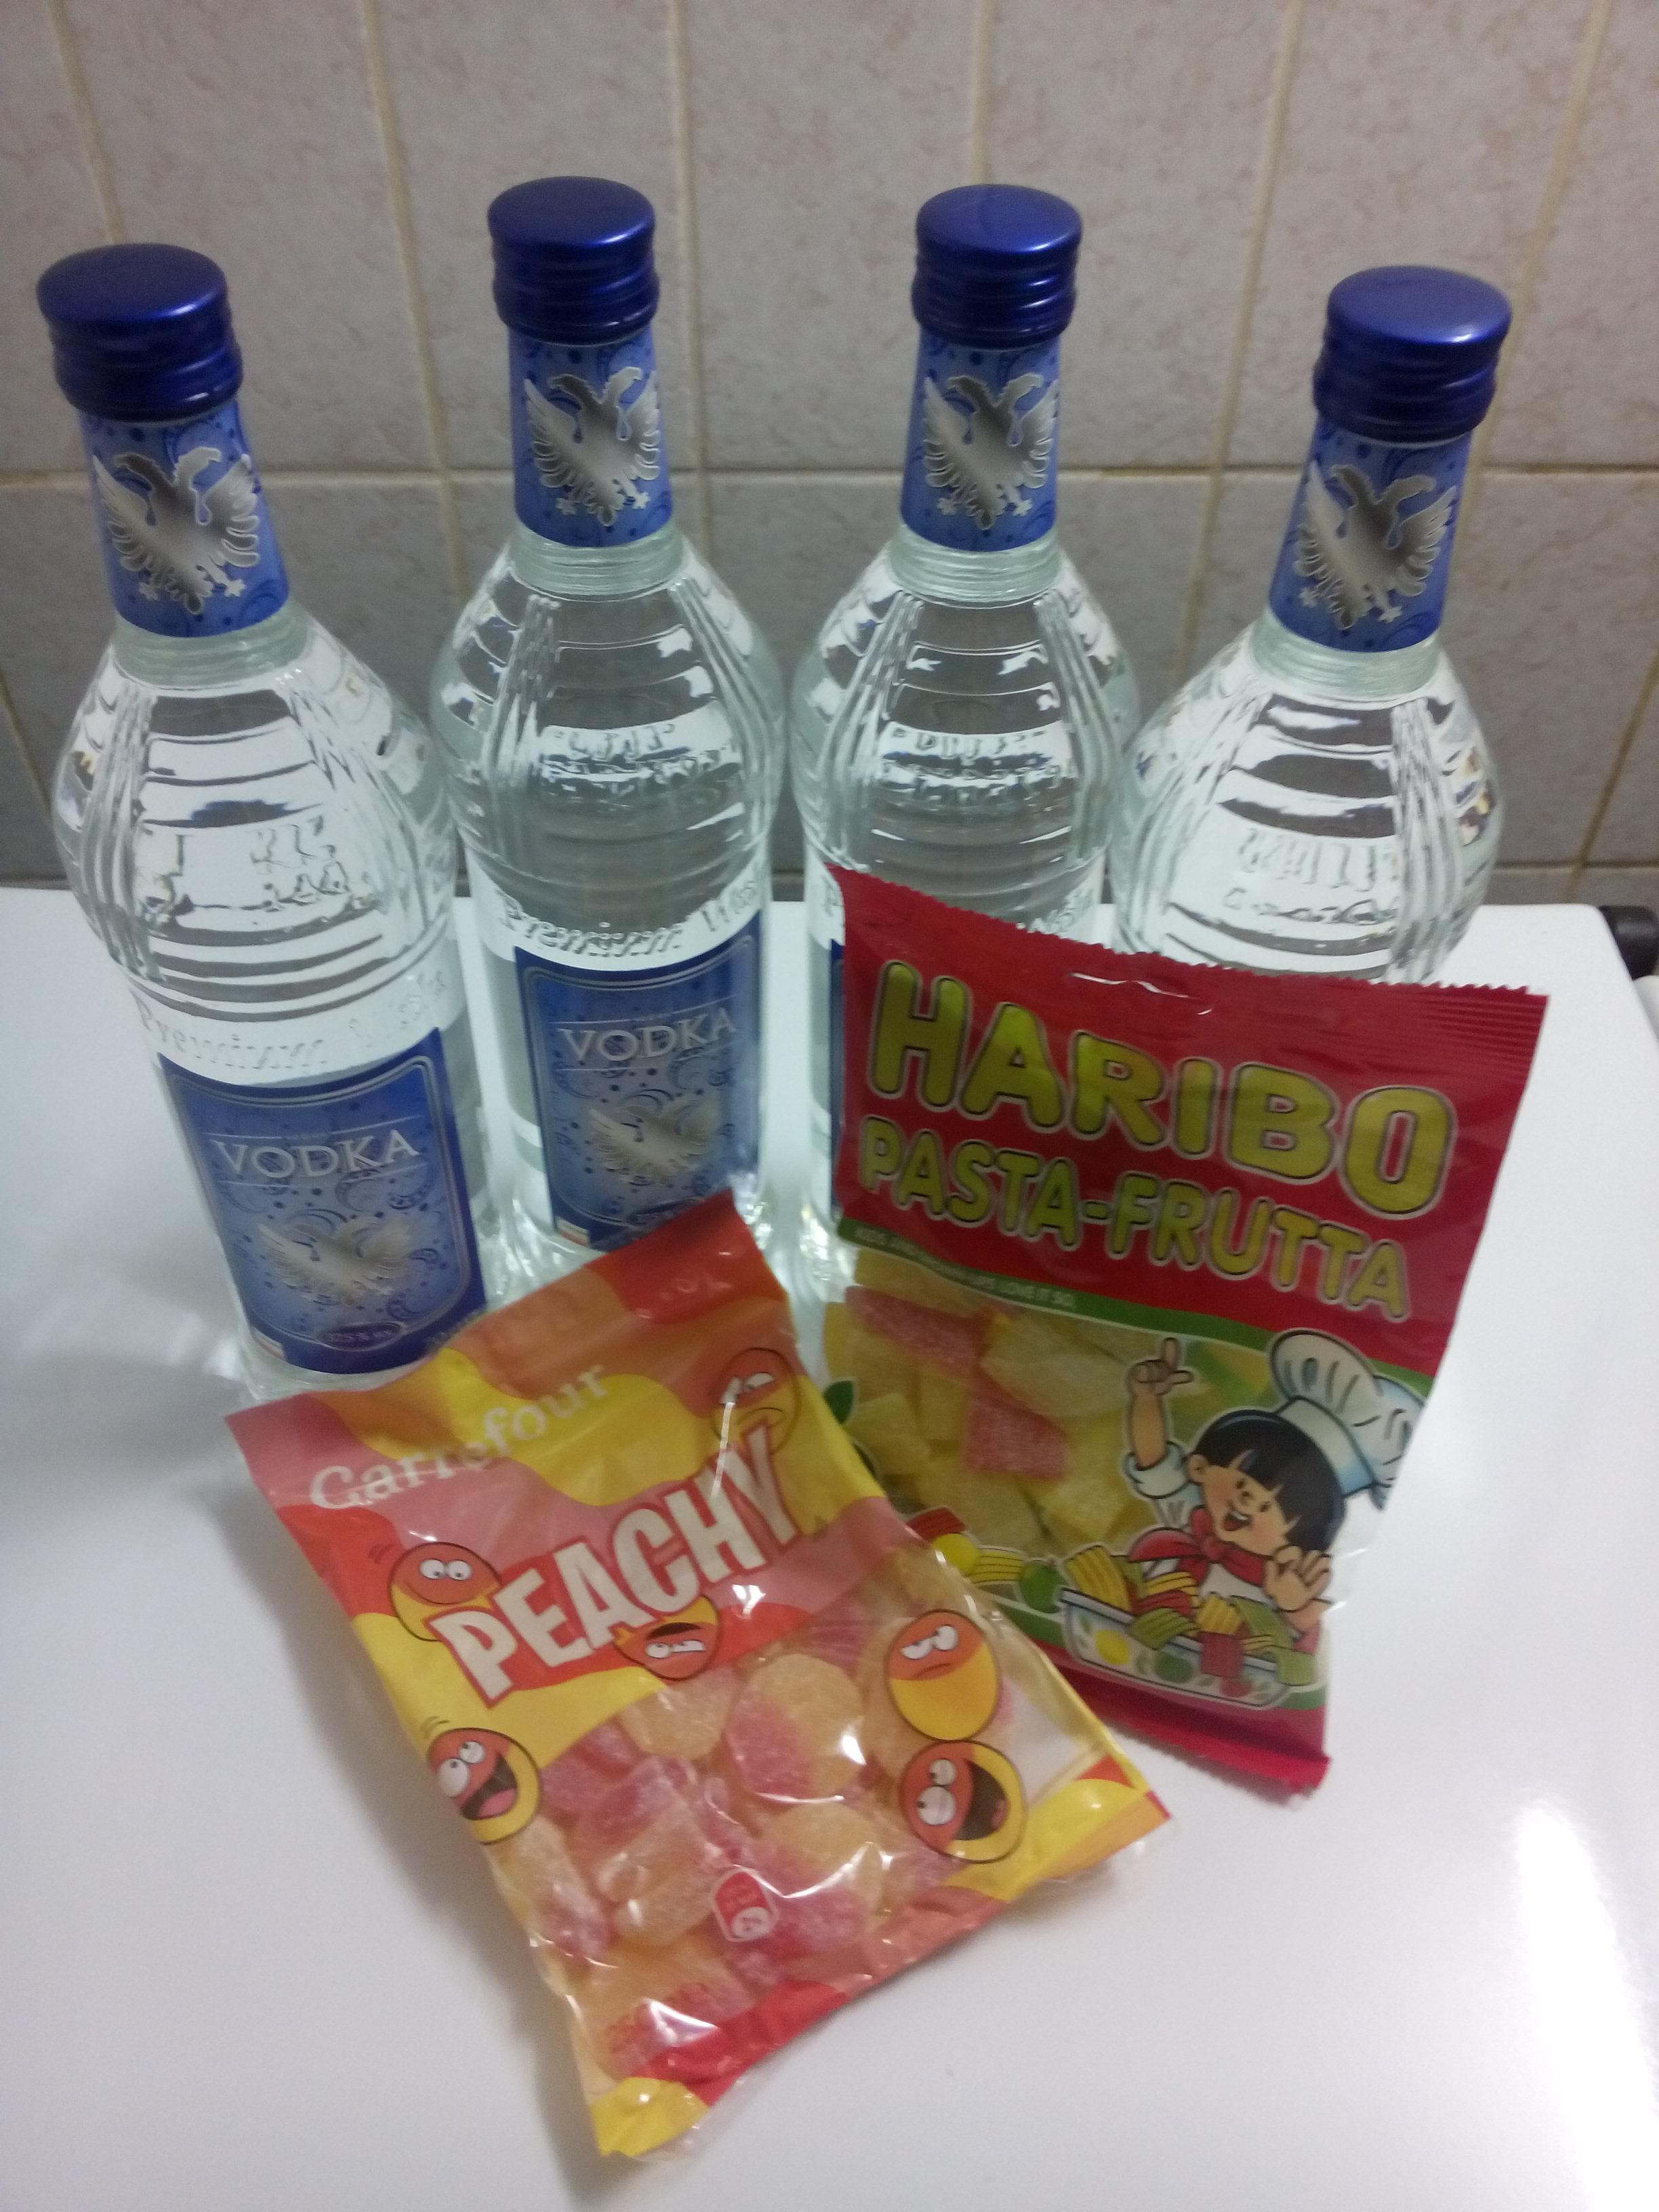 snoepjeswodka - gerhilde maakt